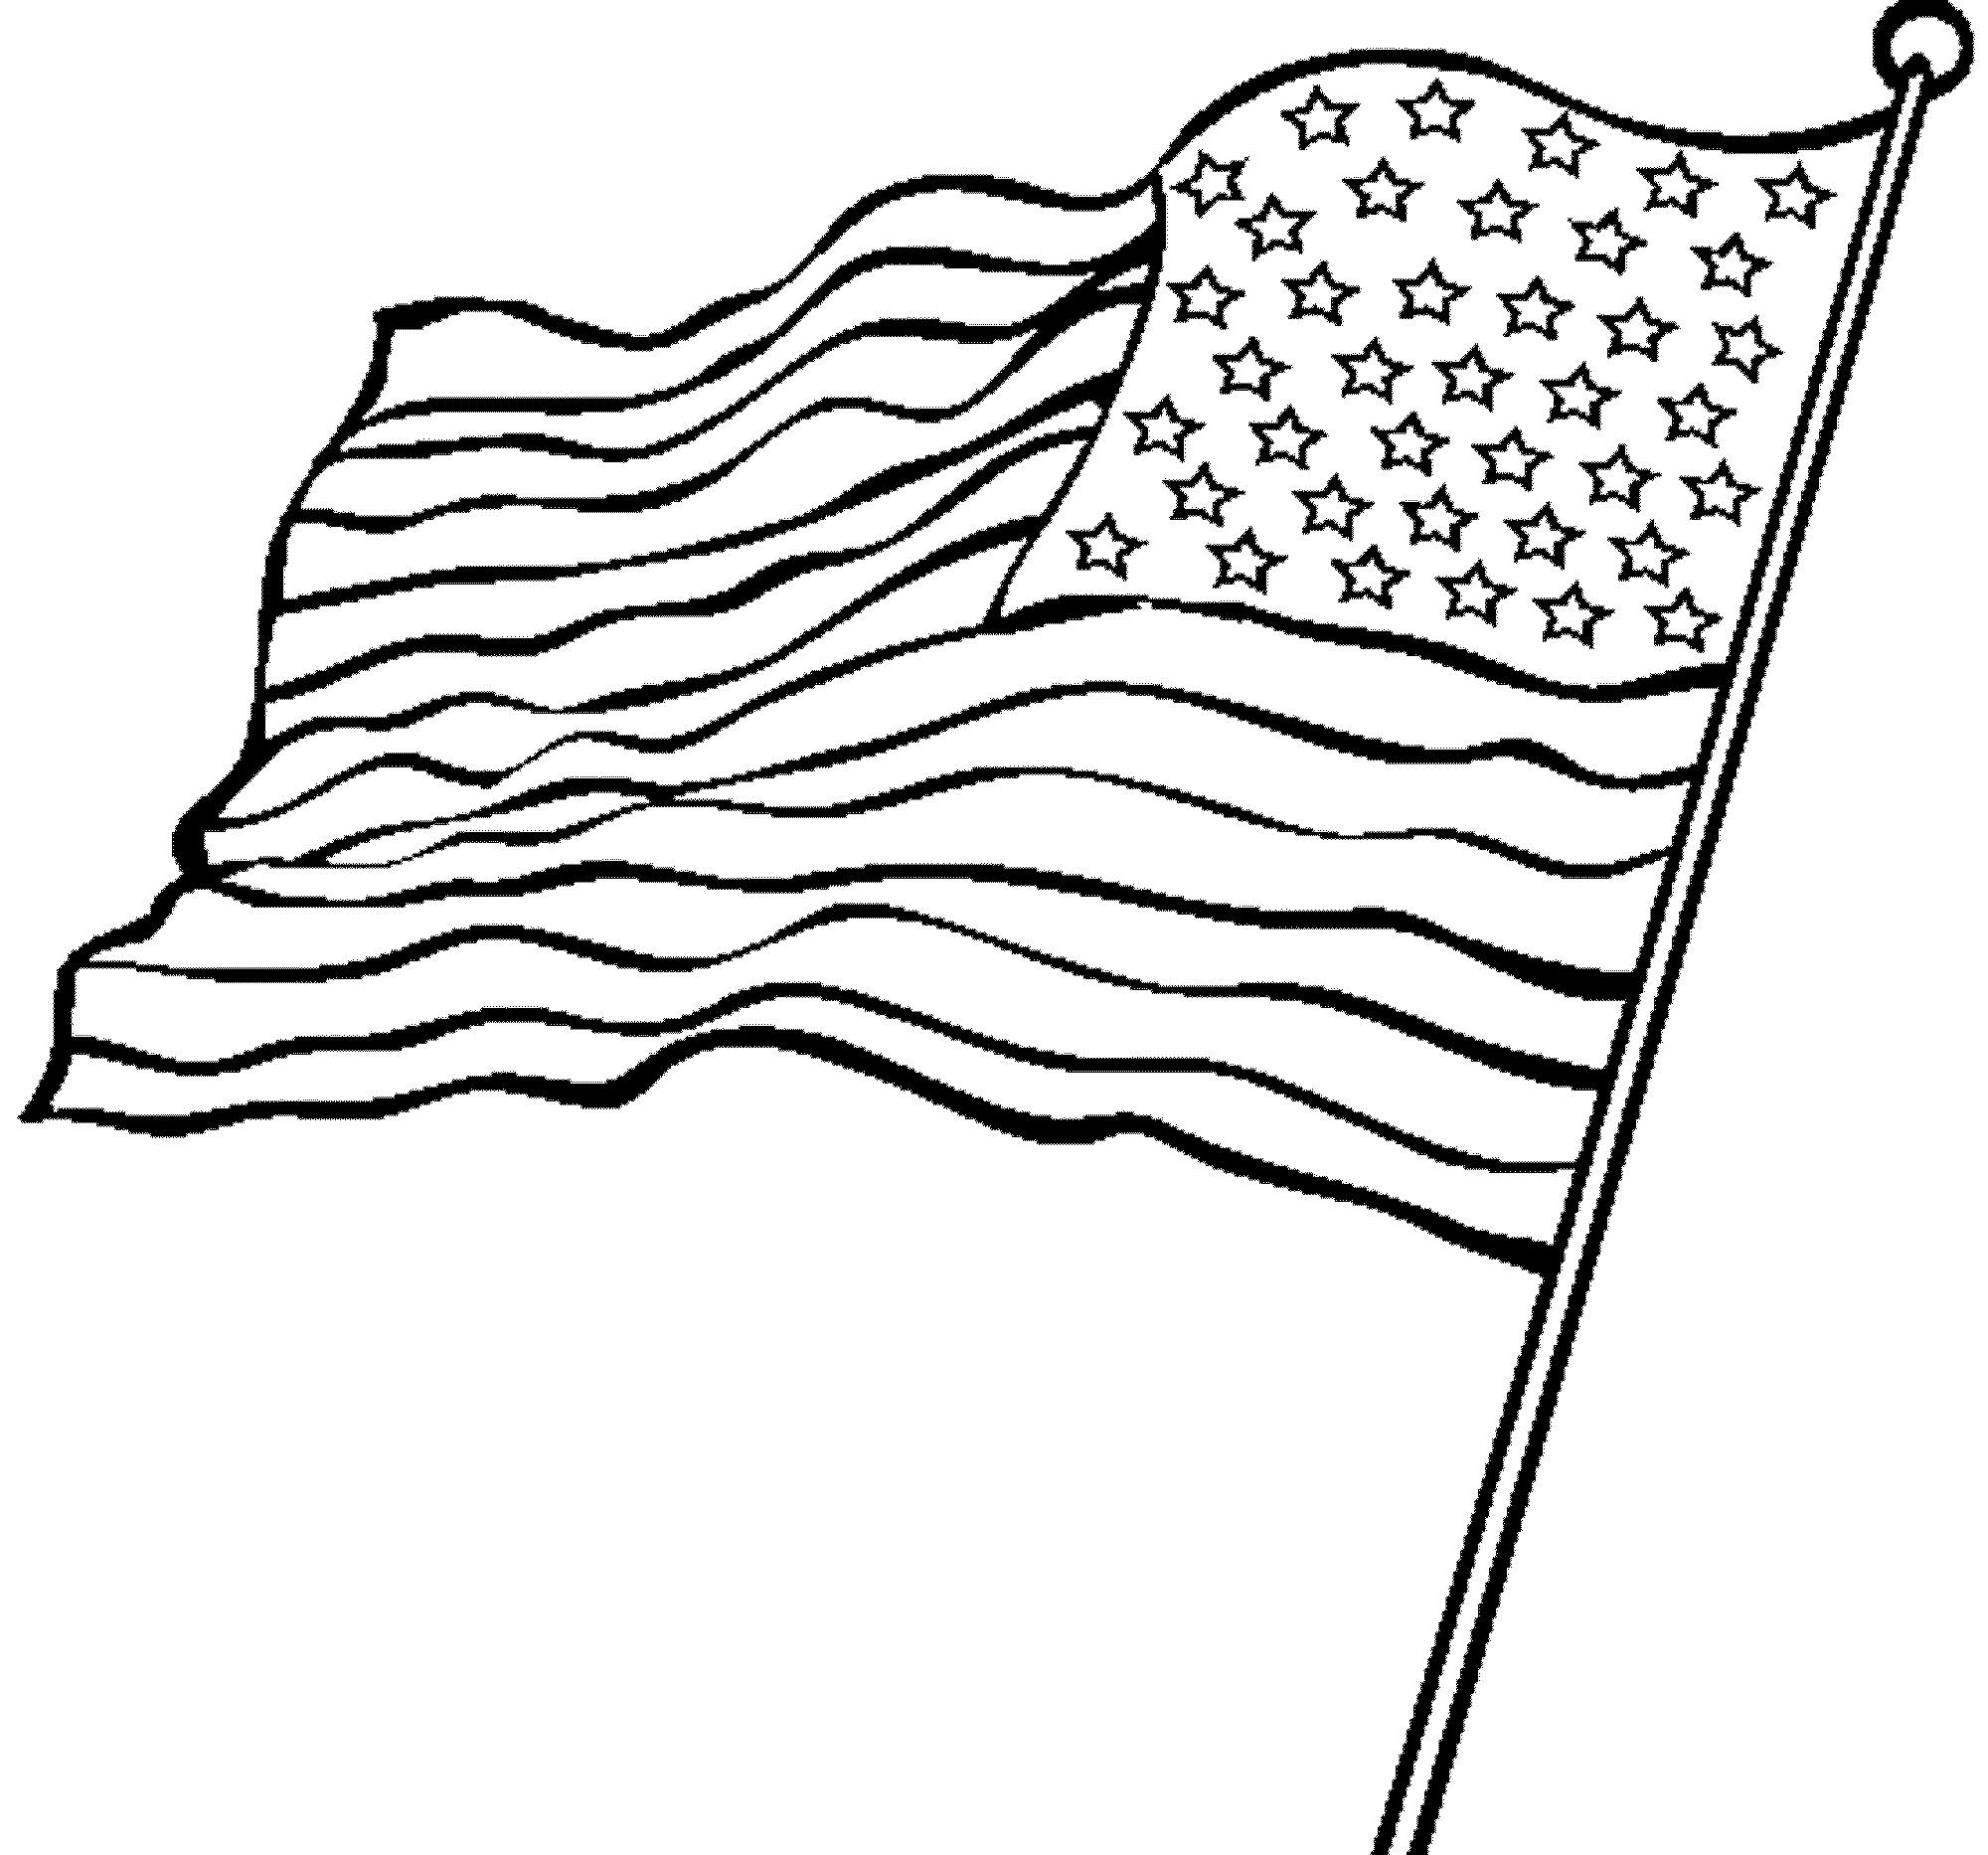 American Flag Pencil Drawing At Getdrawings